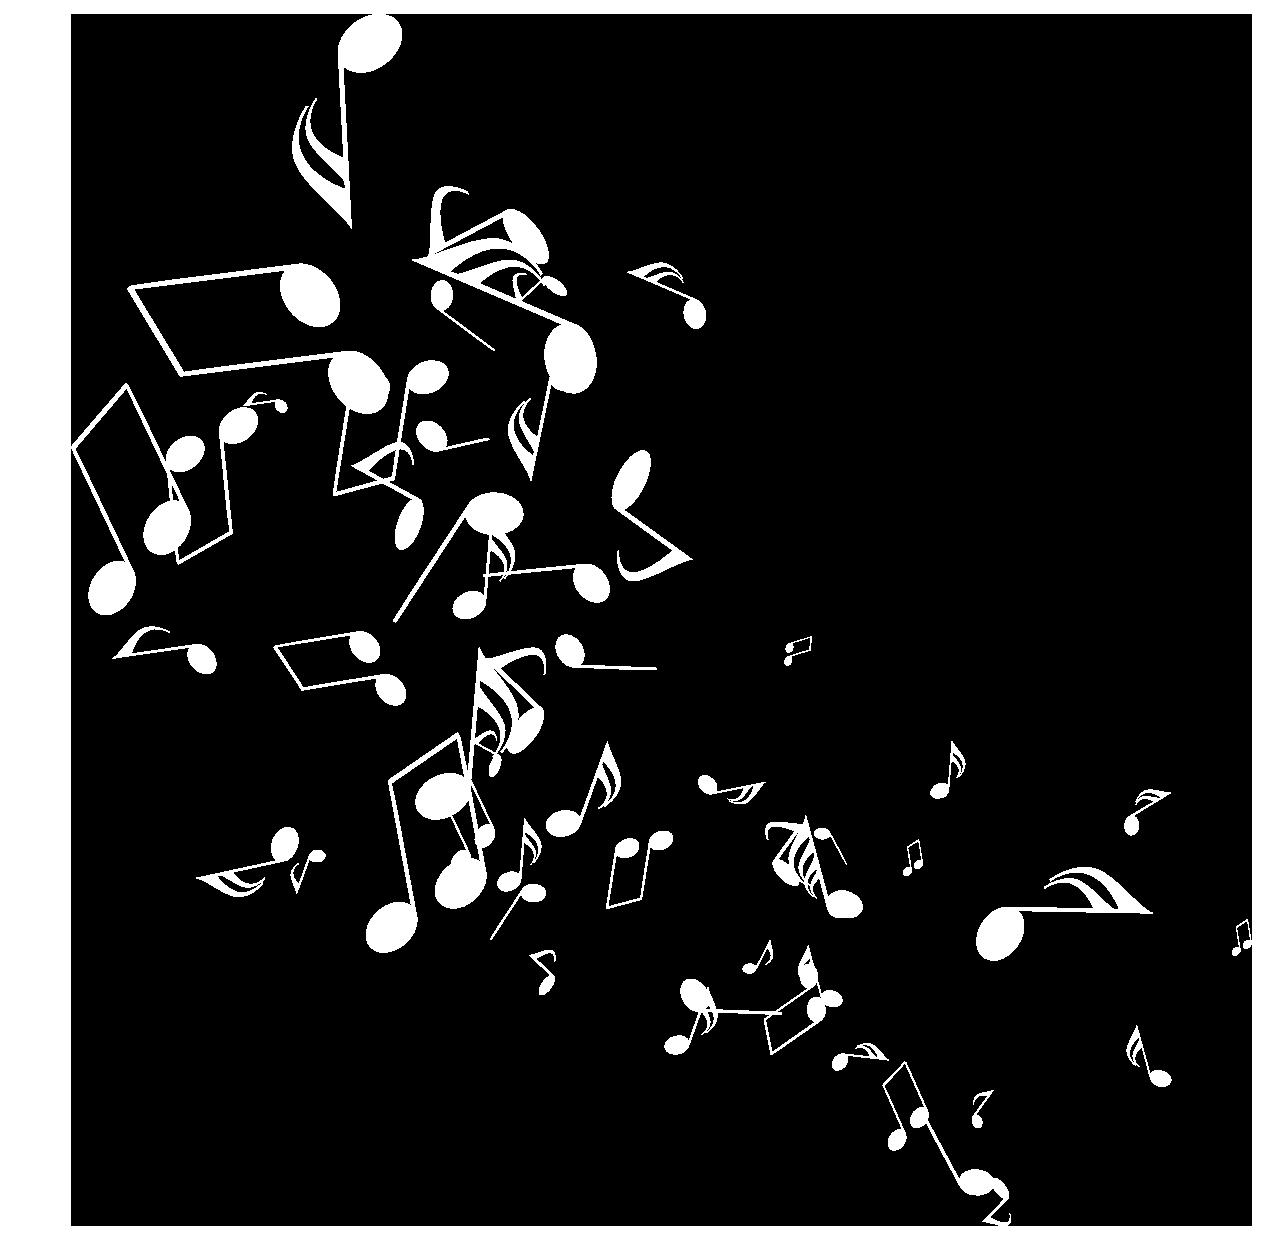 SKIO Music | The Freedom to Create